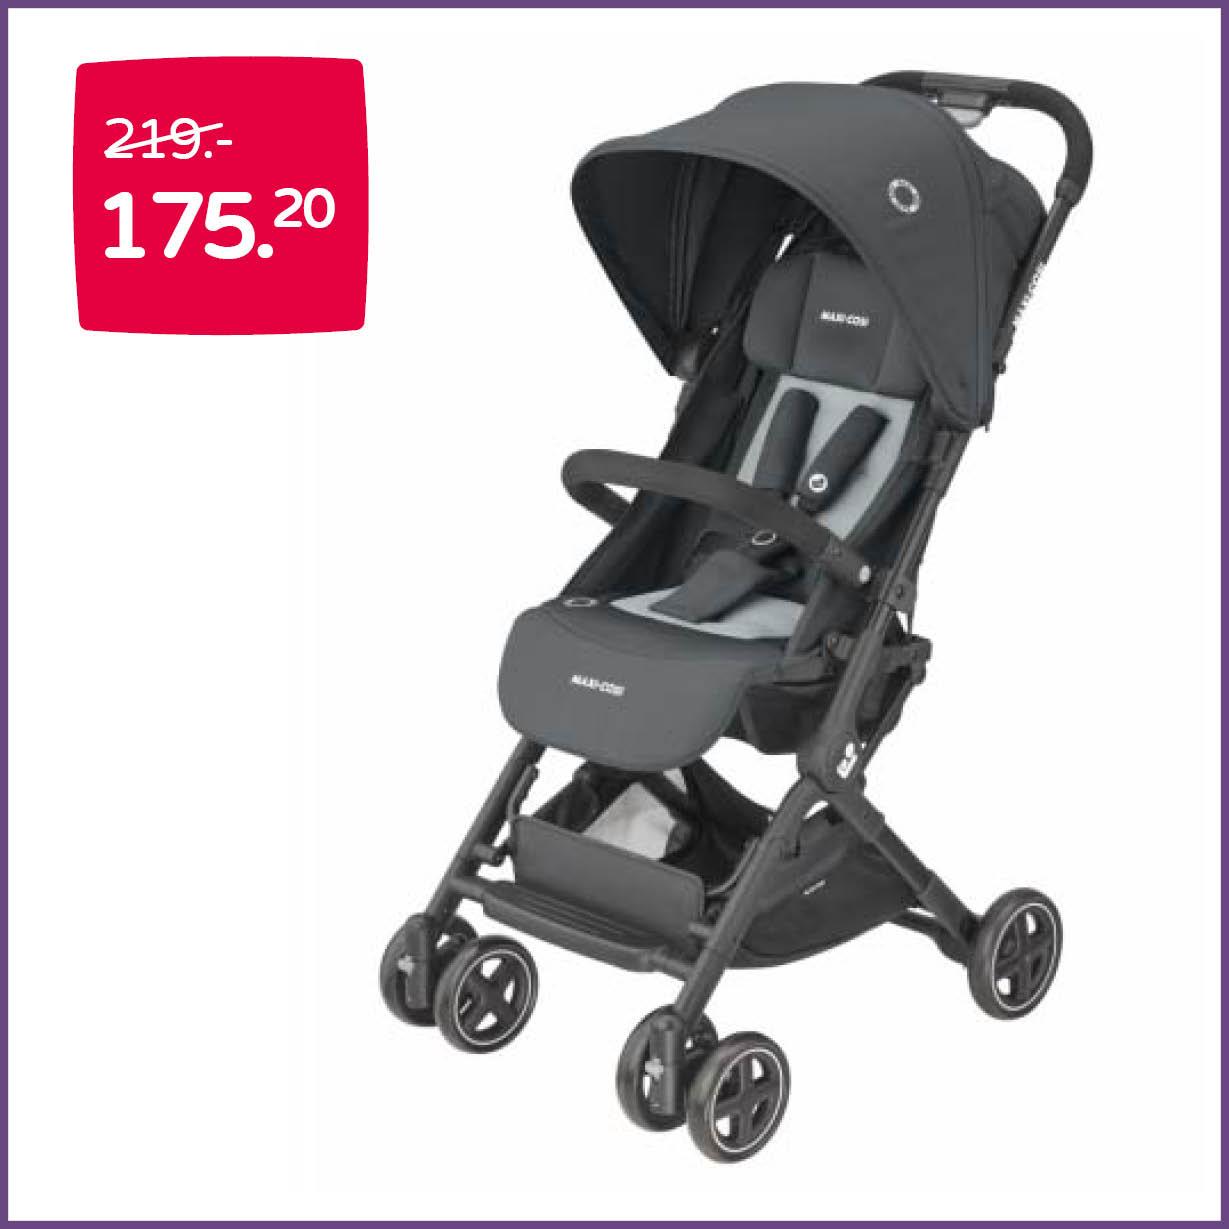 Shop Maxi-Cosi Lara2 buggy